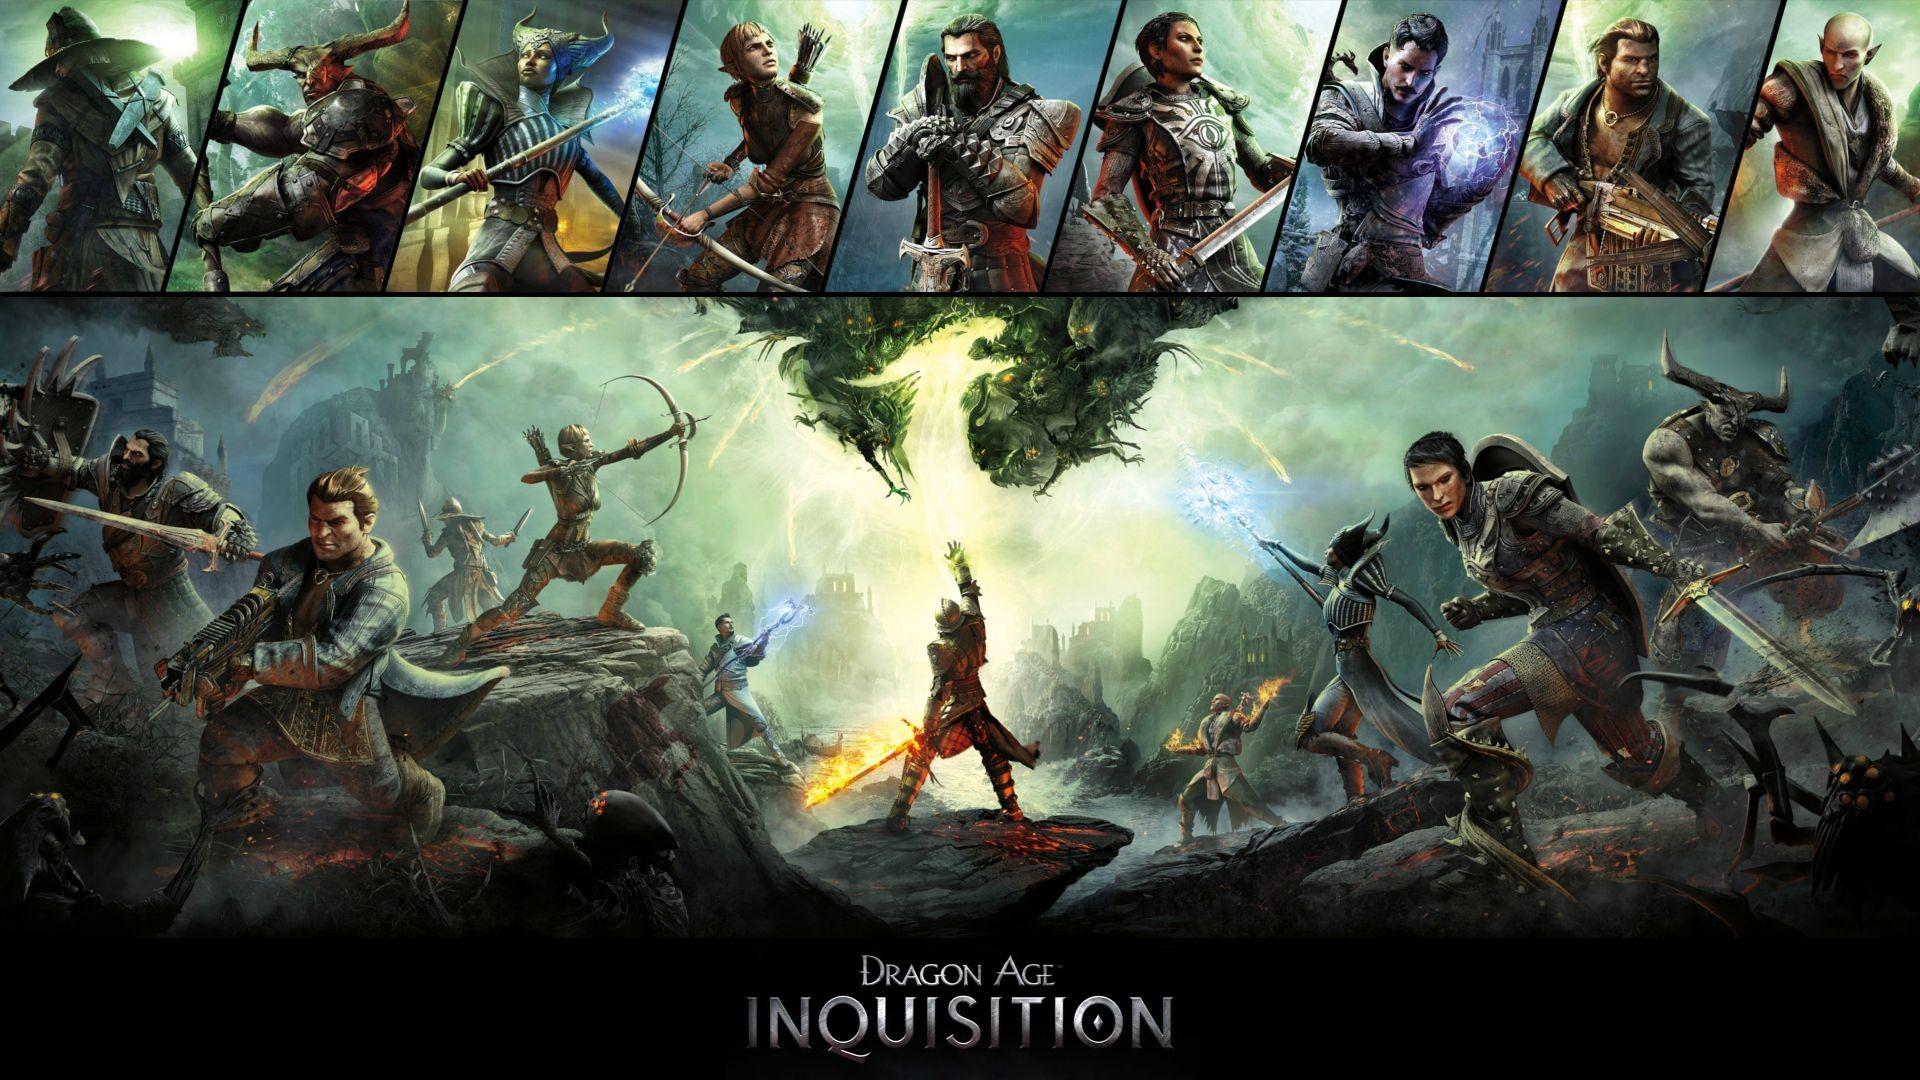 1920x1080 Px Cassandra Pentaghast Dragon Age Inquisition Video